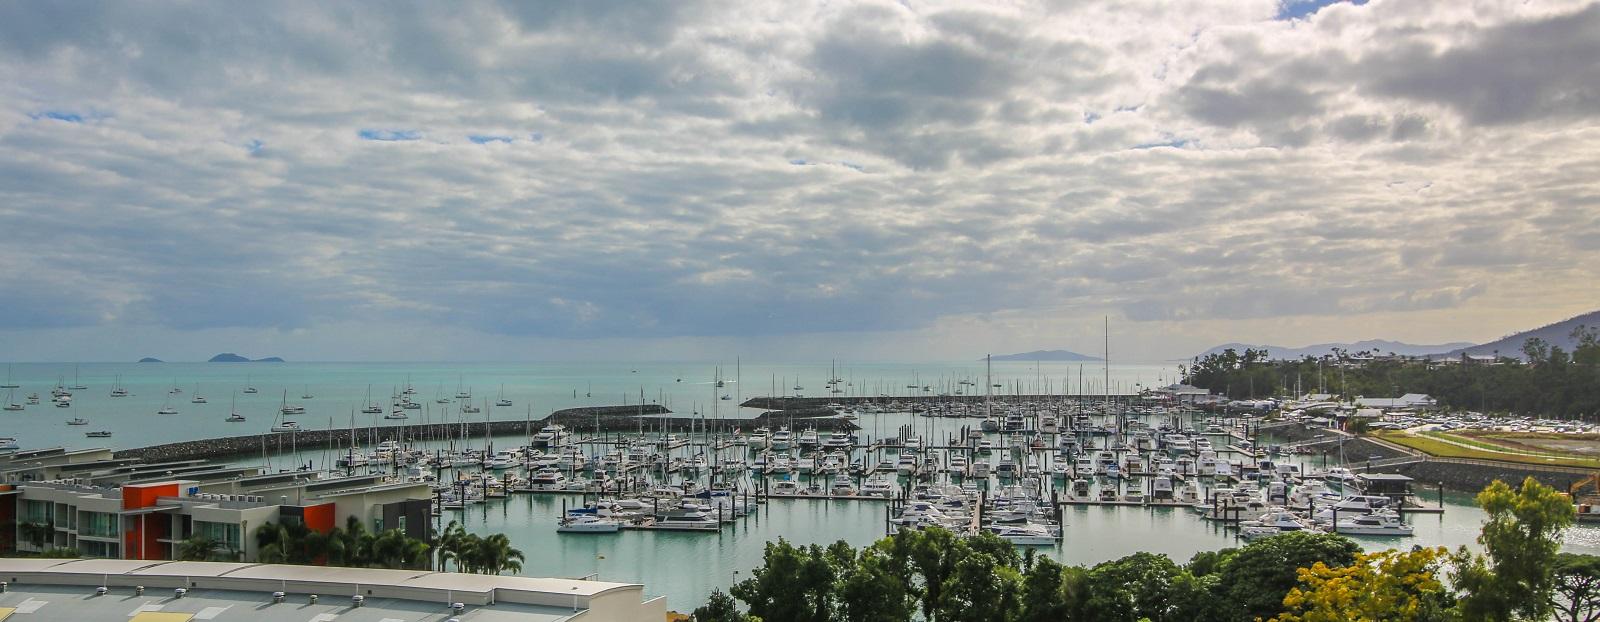 Abell Point Marina where the bulk of the fleet stays - Vampp Photography